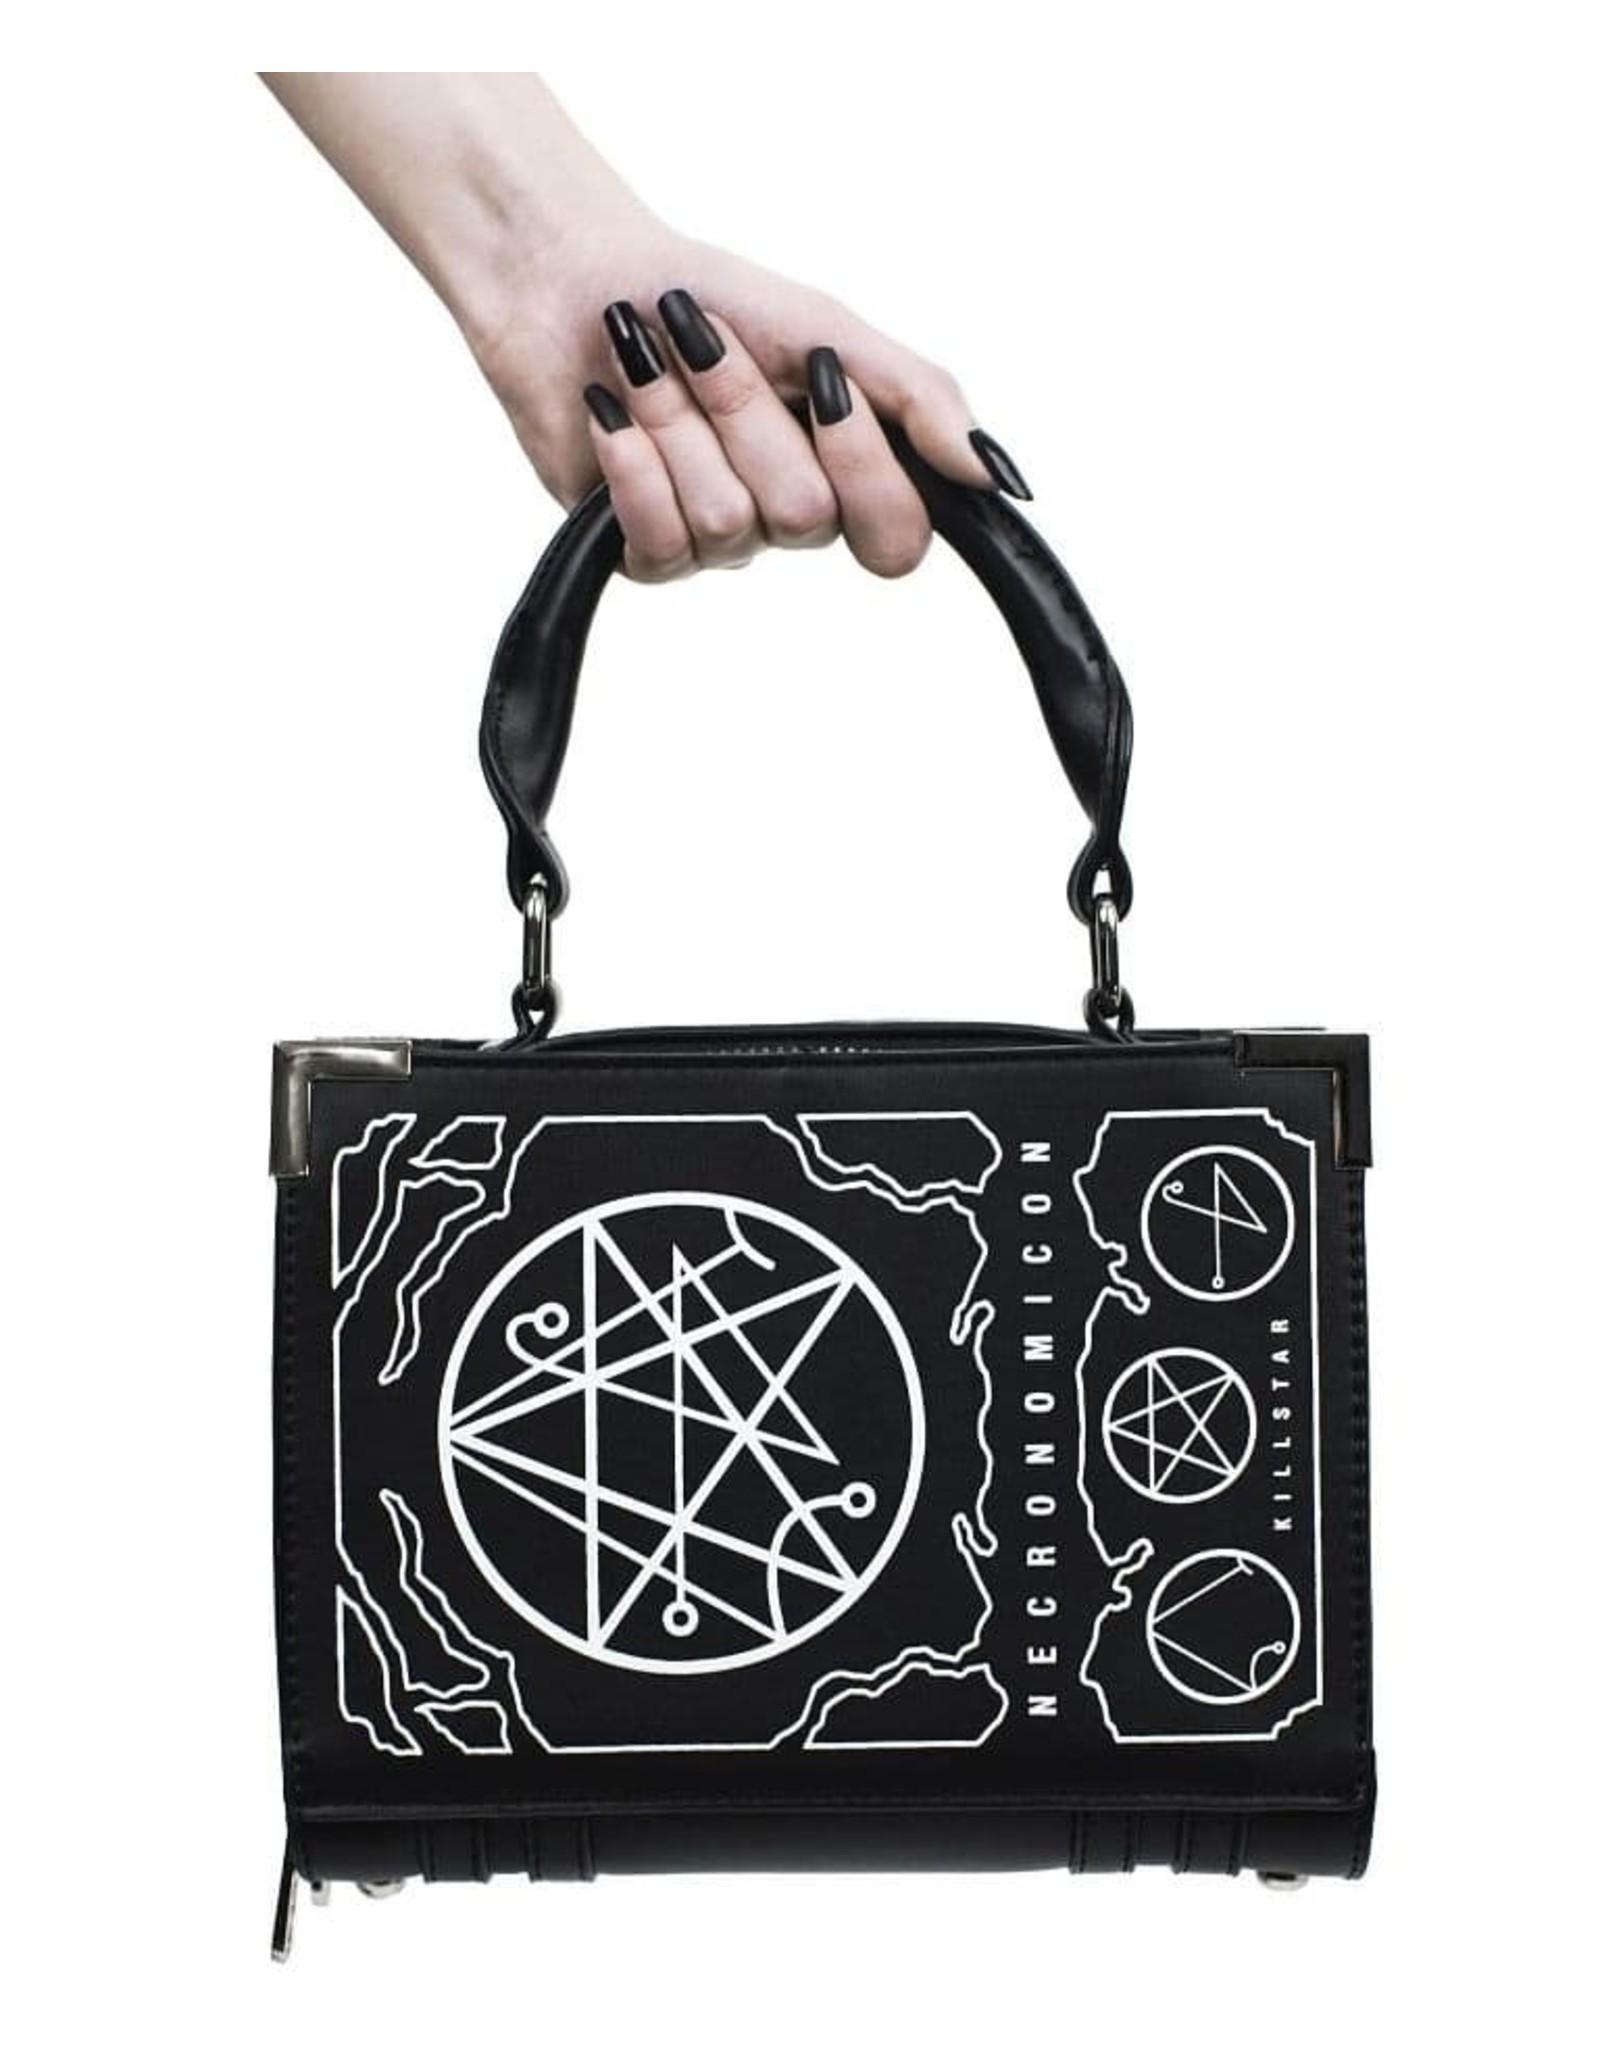 Killstar Gothic bags Steampunk bags - Killstar Necronomicon handbag